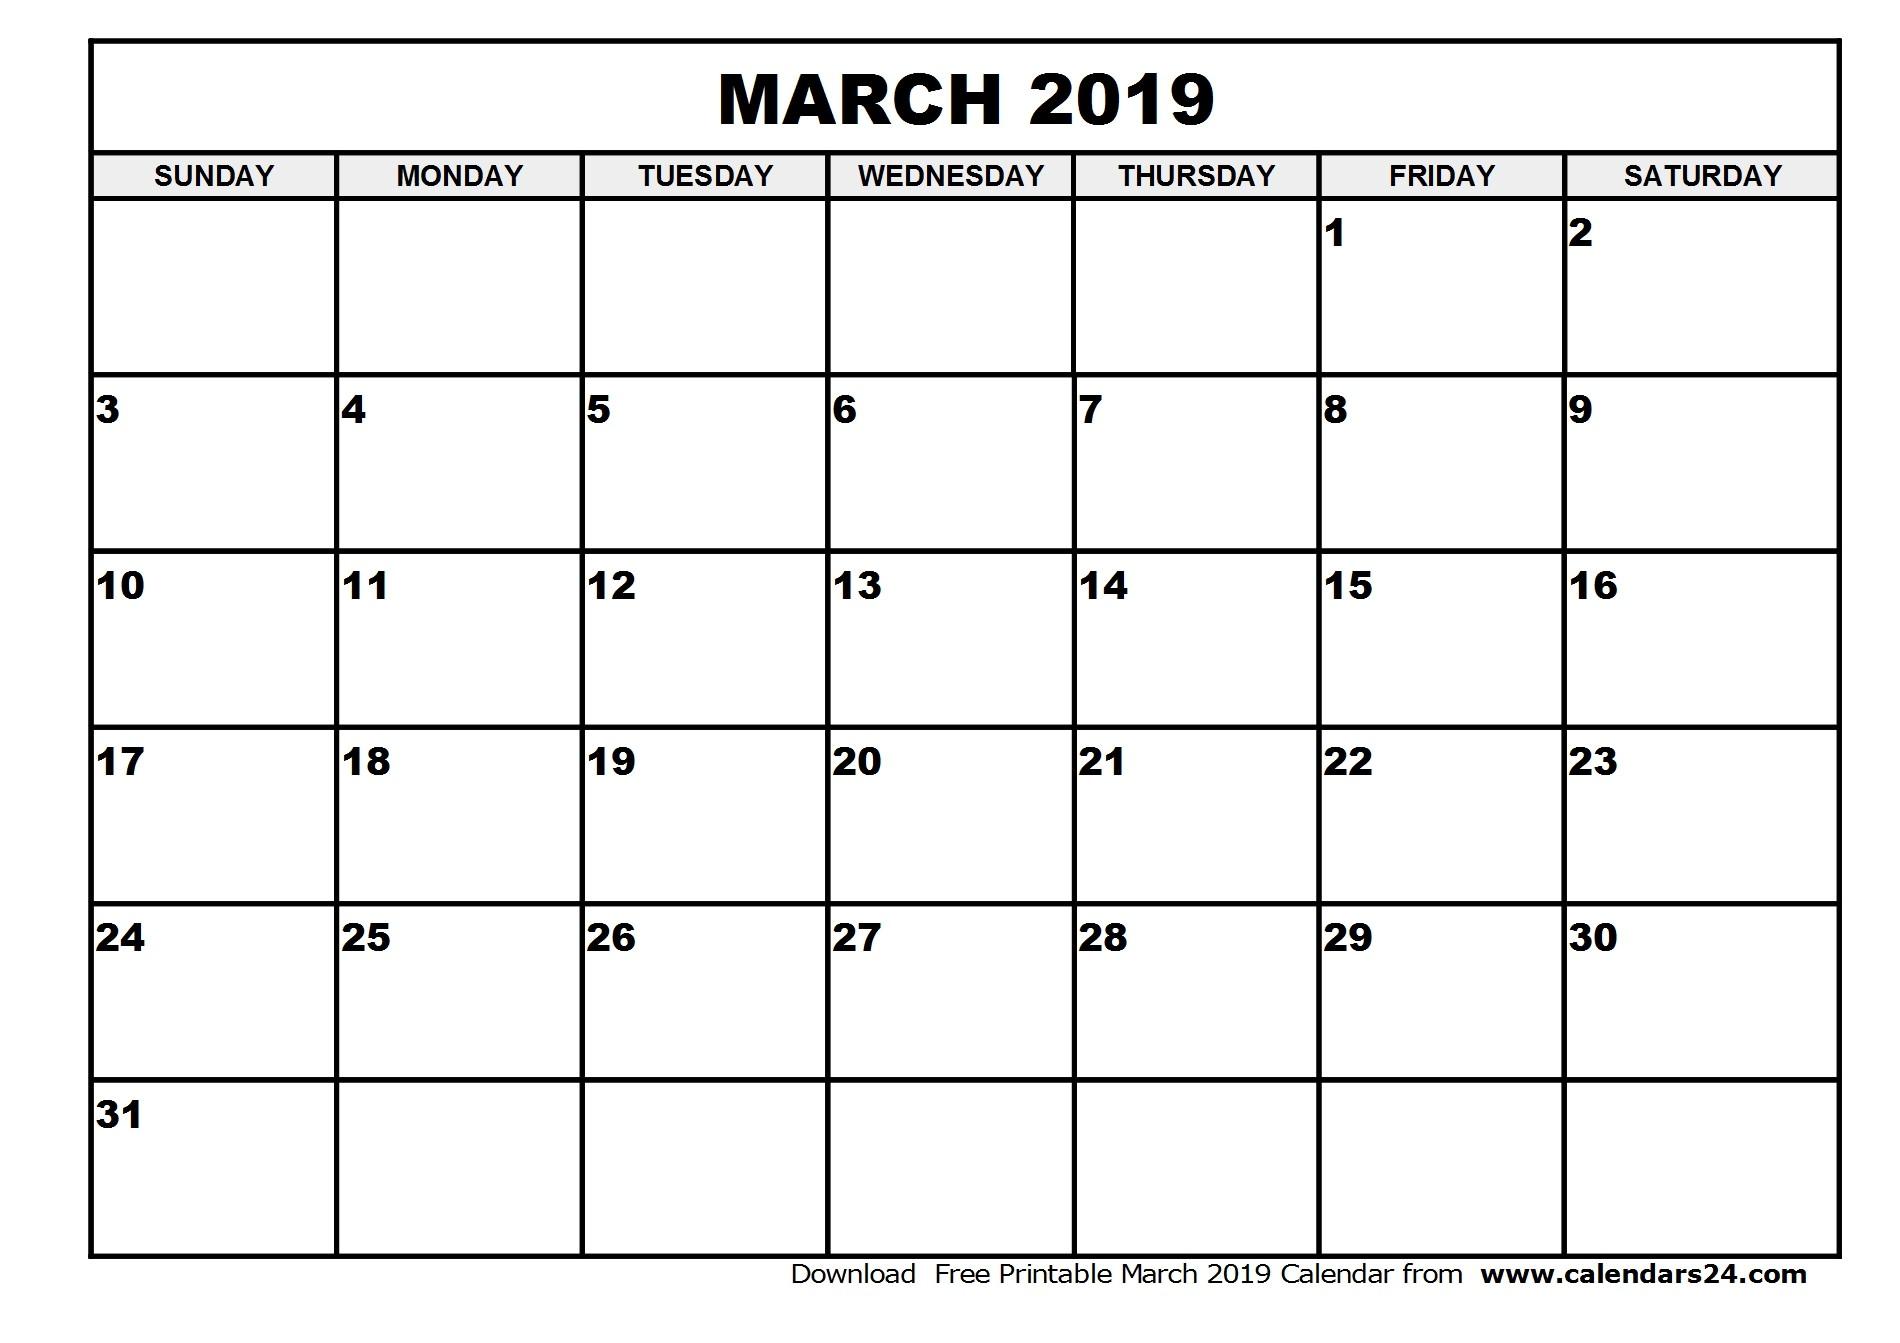 2019 and 2019 Printable Calendars